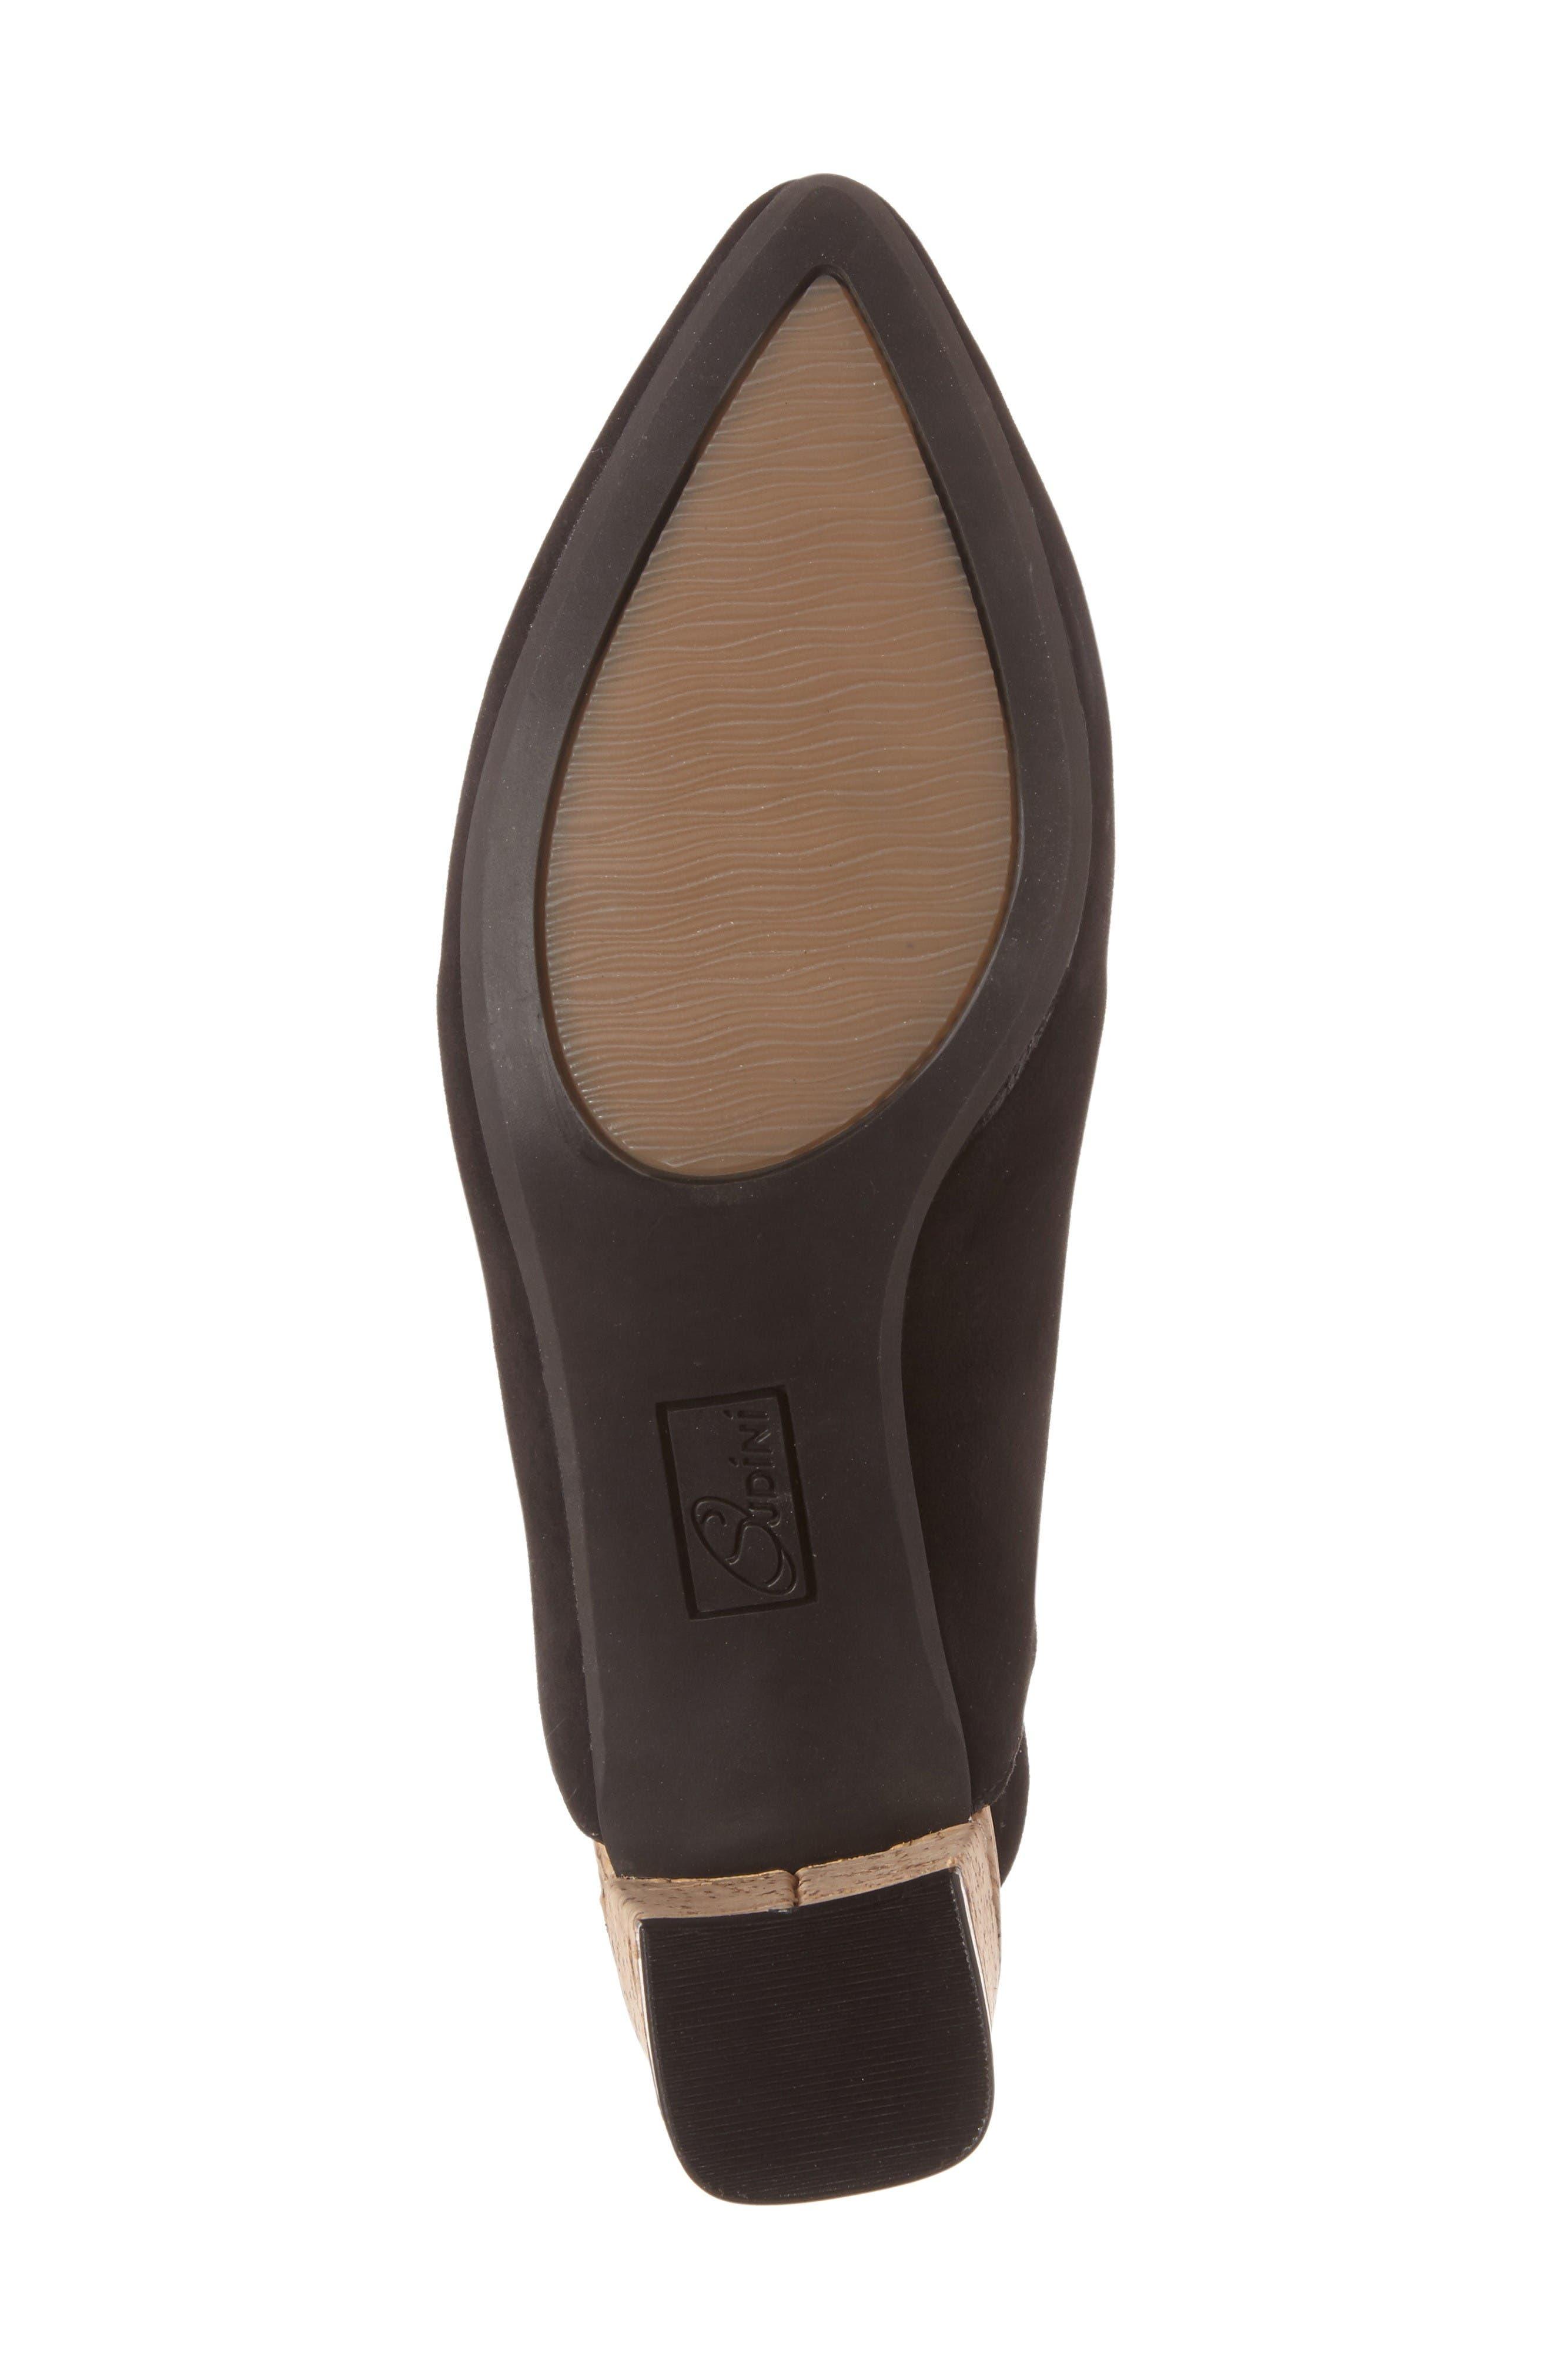 Bally Slingback Pump,                             Alternate thumbnail 4, color,                             Black Leather